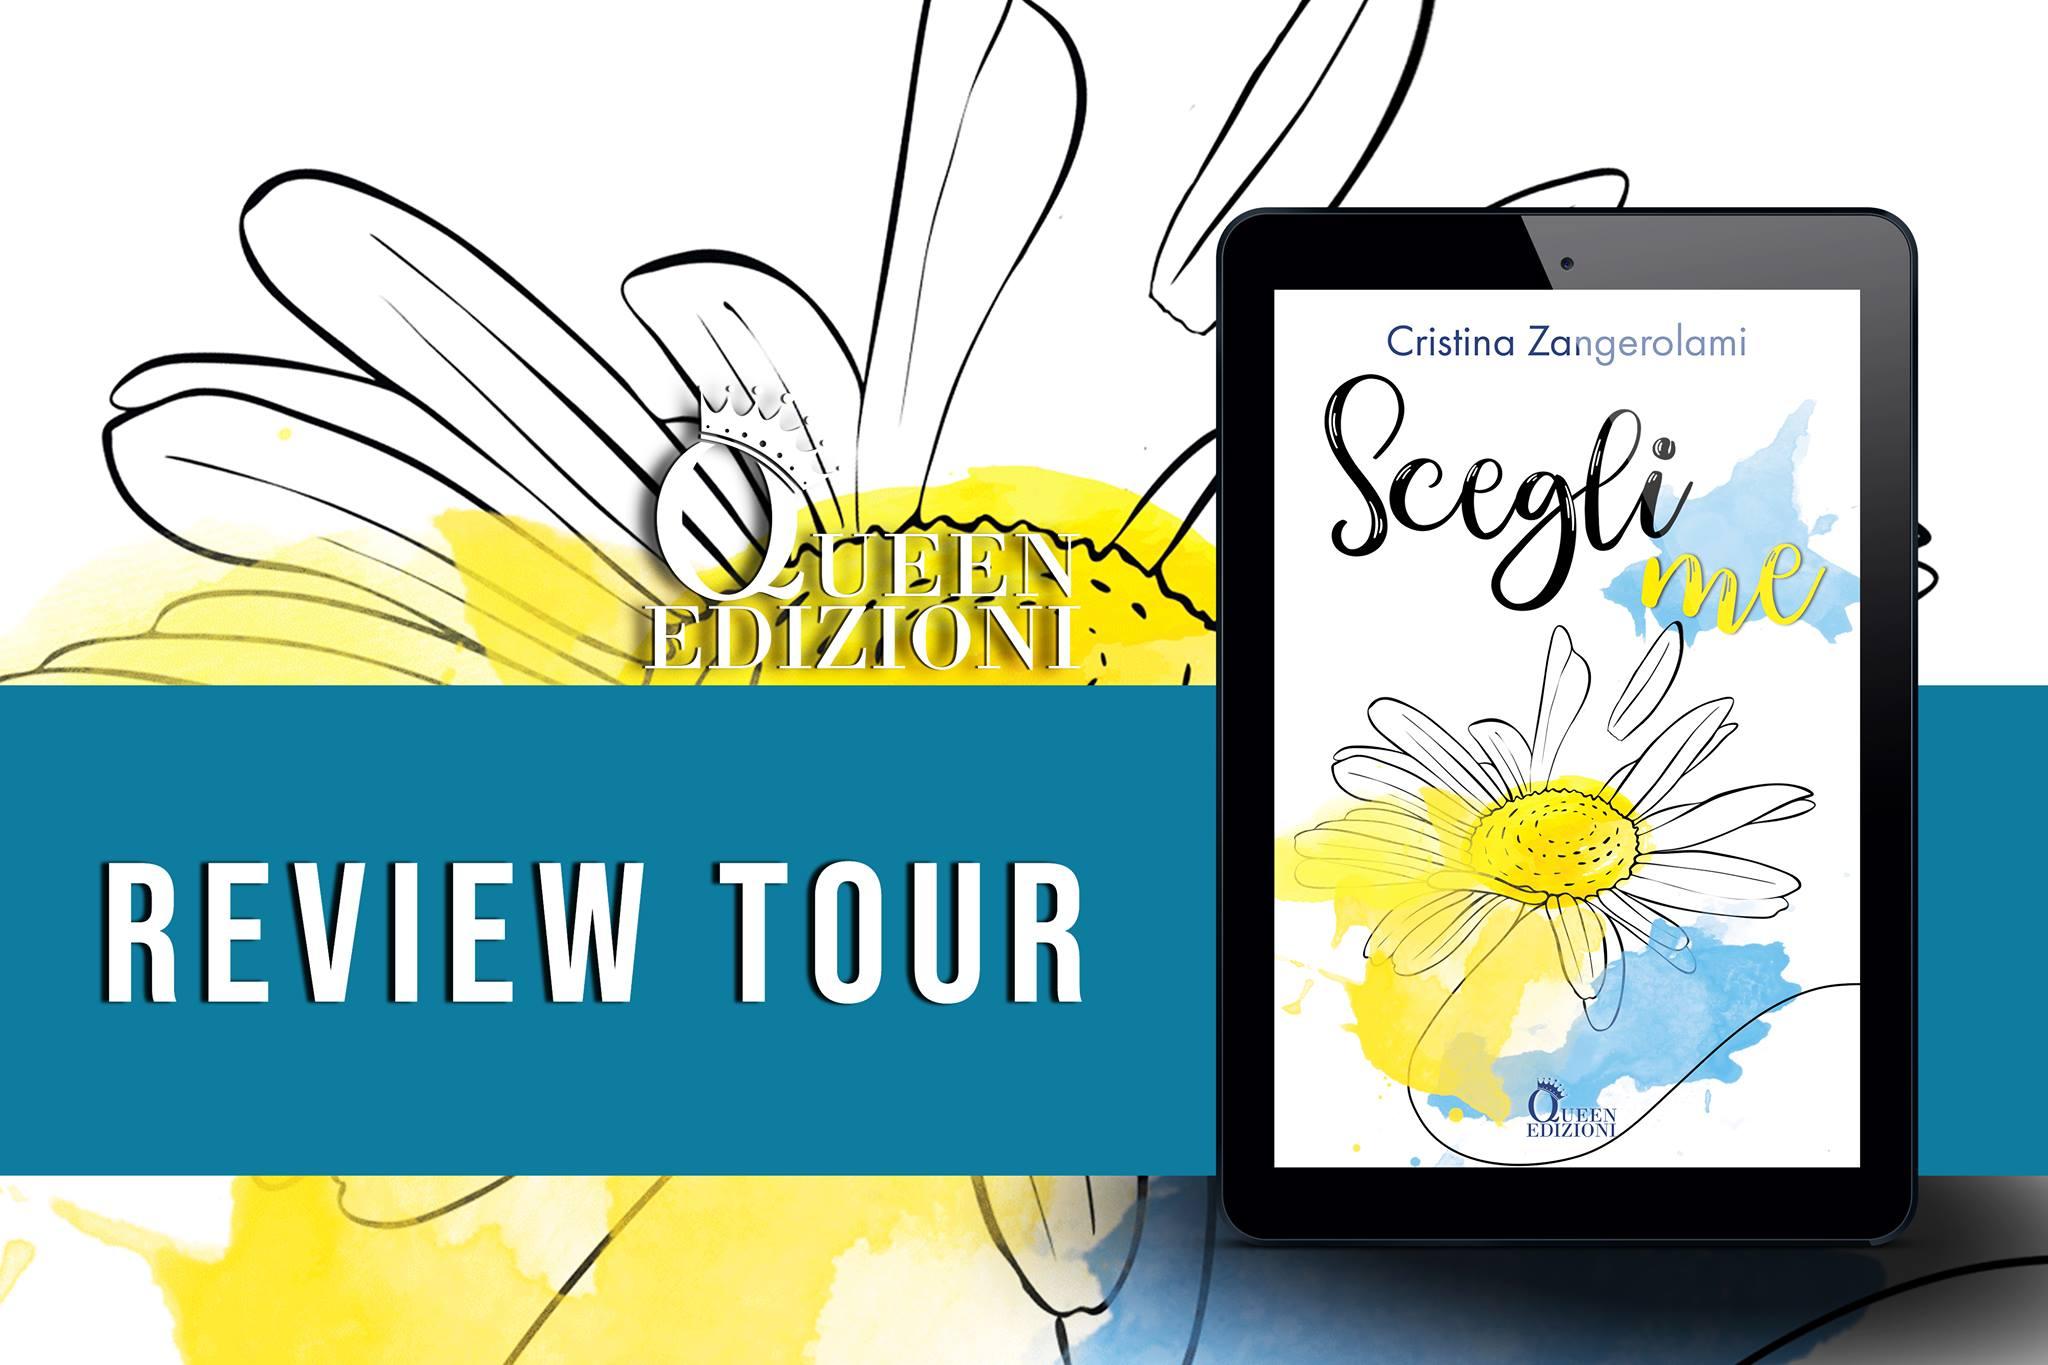 review tour banner cristina sangerolami